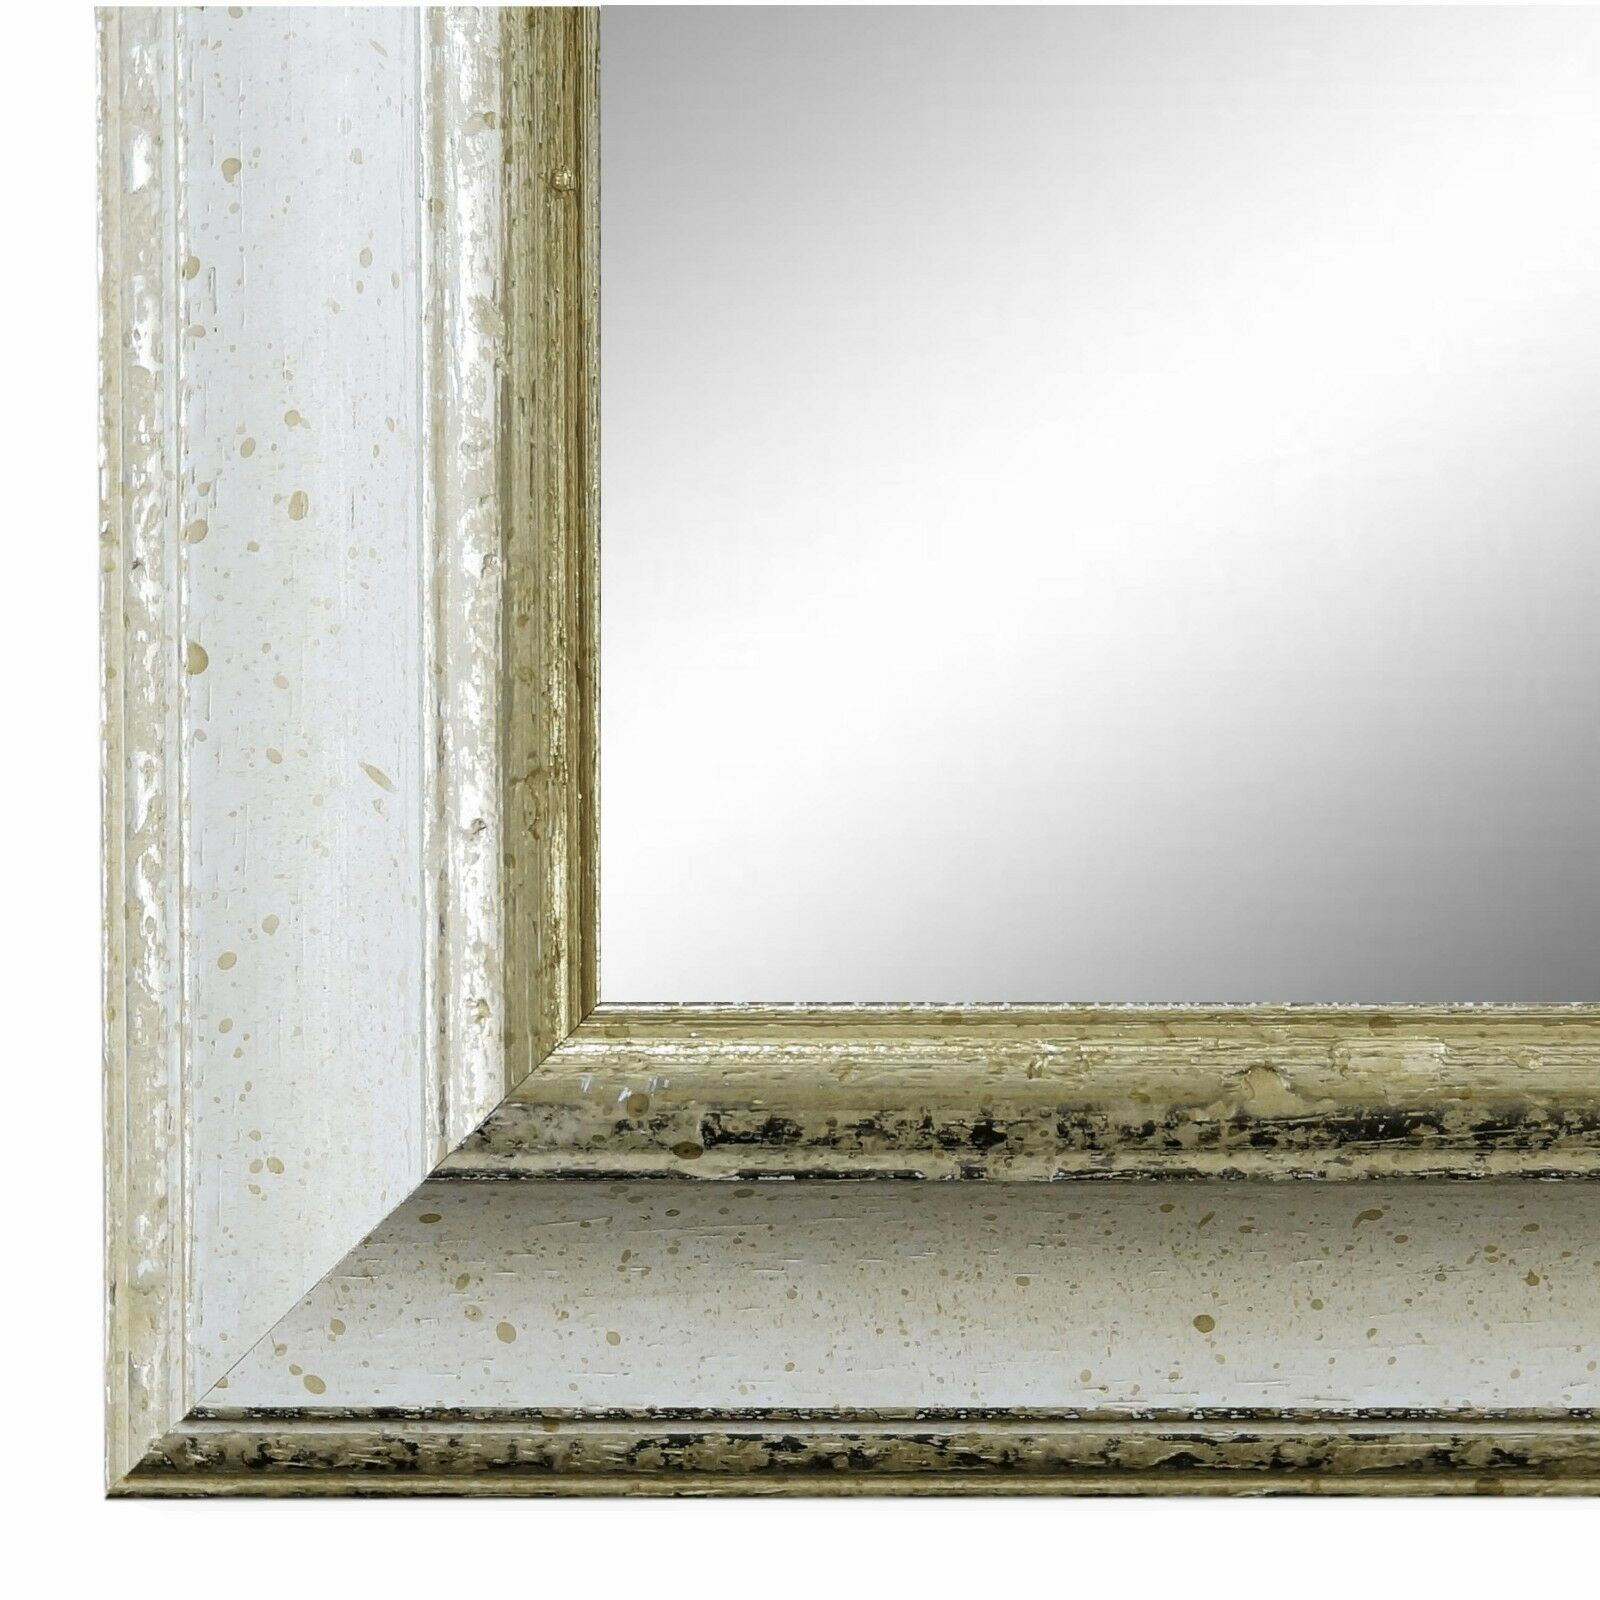 Wandspiegel Spiegel Weiss Silber Vintage Retro Holz Genua 4, 3 - NEU ...